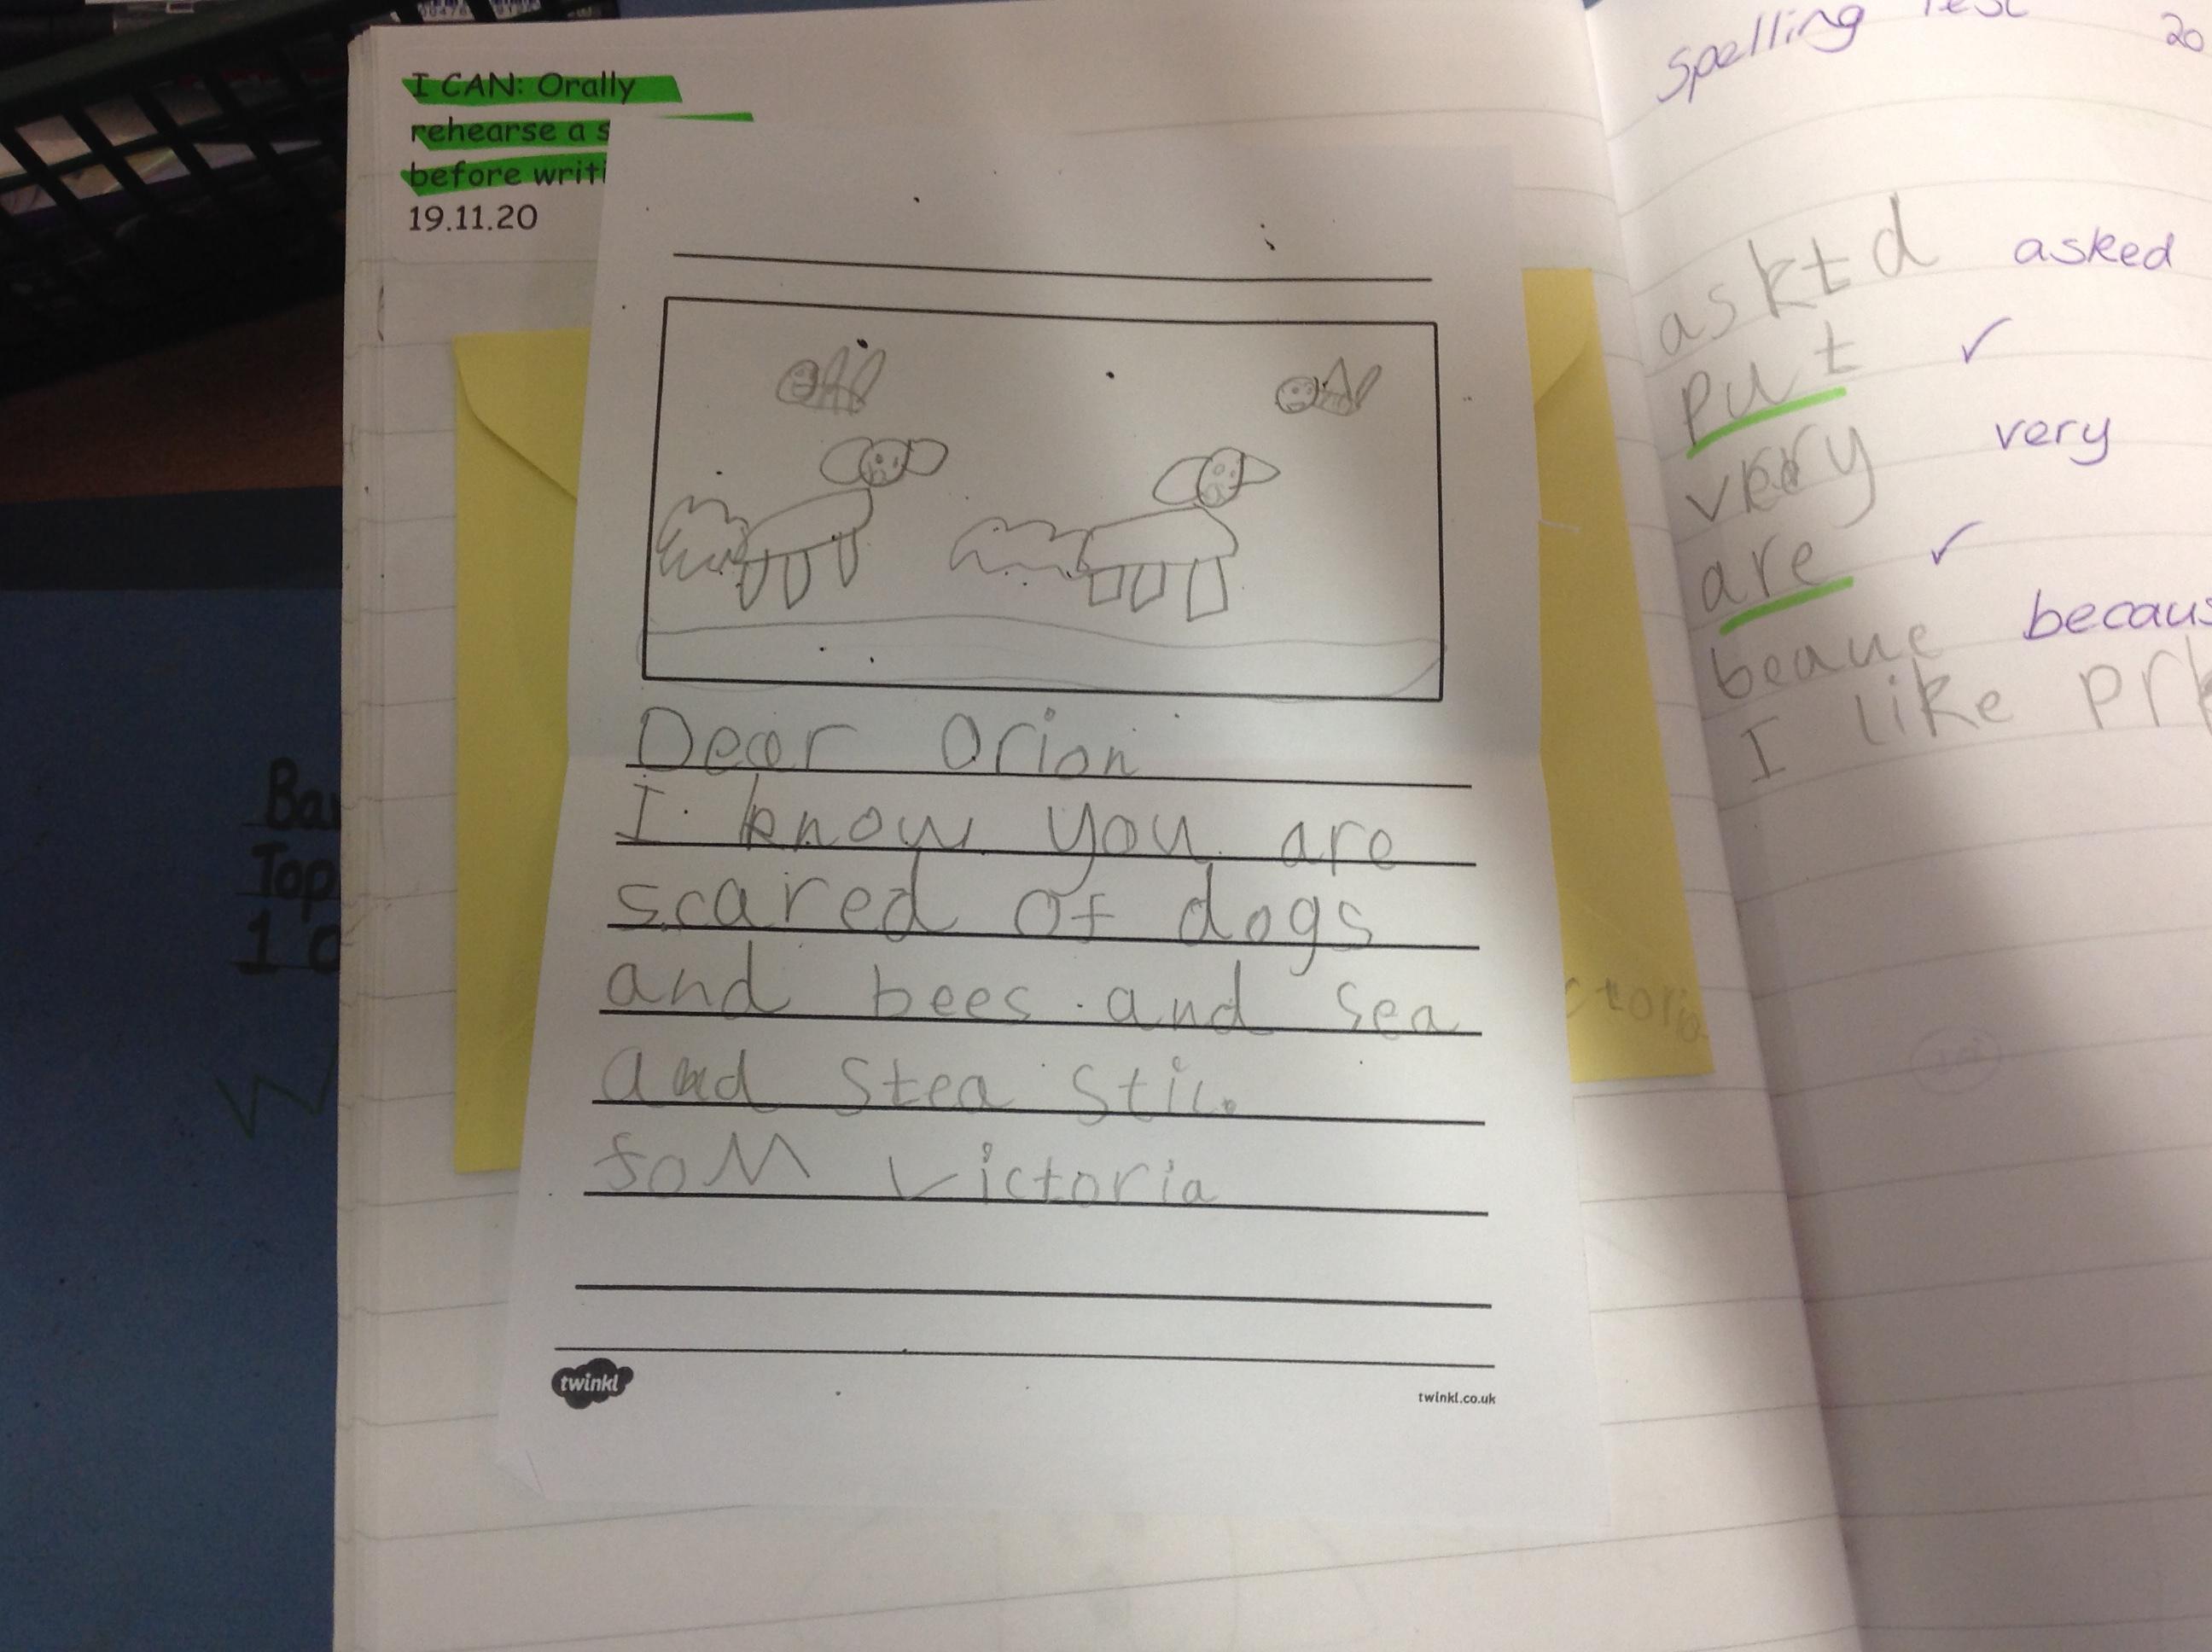 Victoria's wonderful writing!